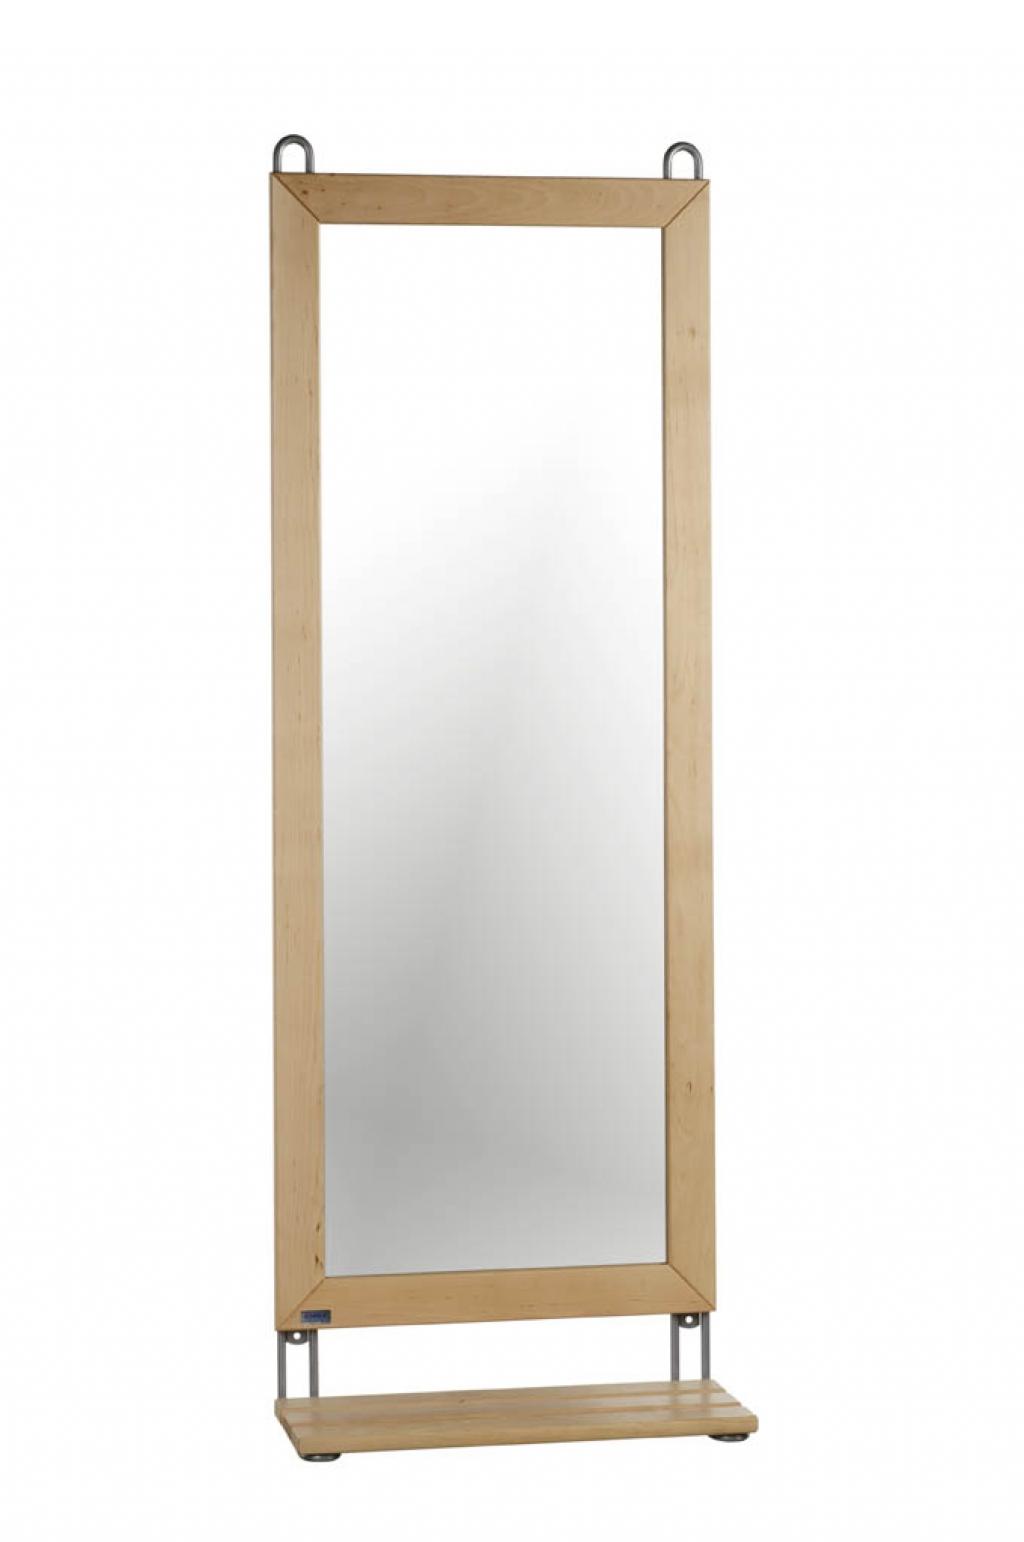 Spegel_bjork/krom